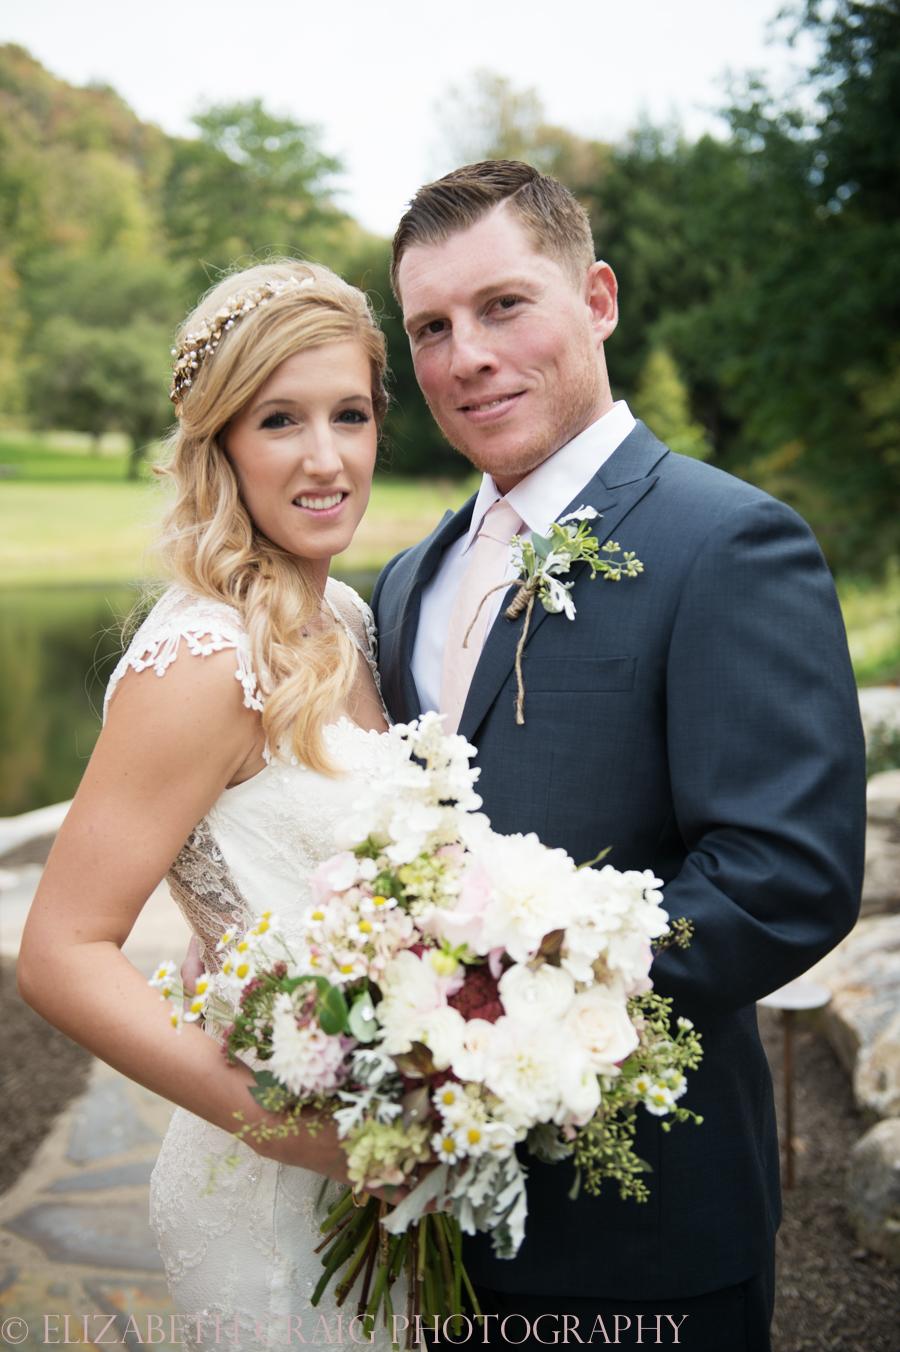 Dubois Brockway St. Marys PA Weddings-0119